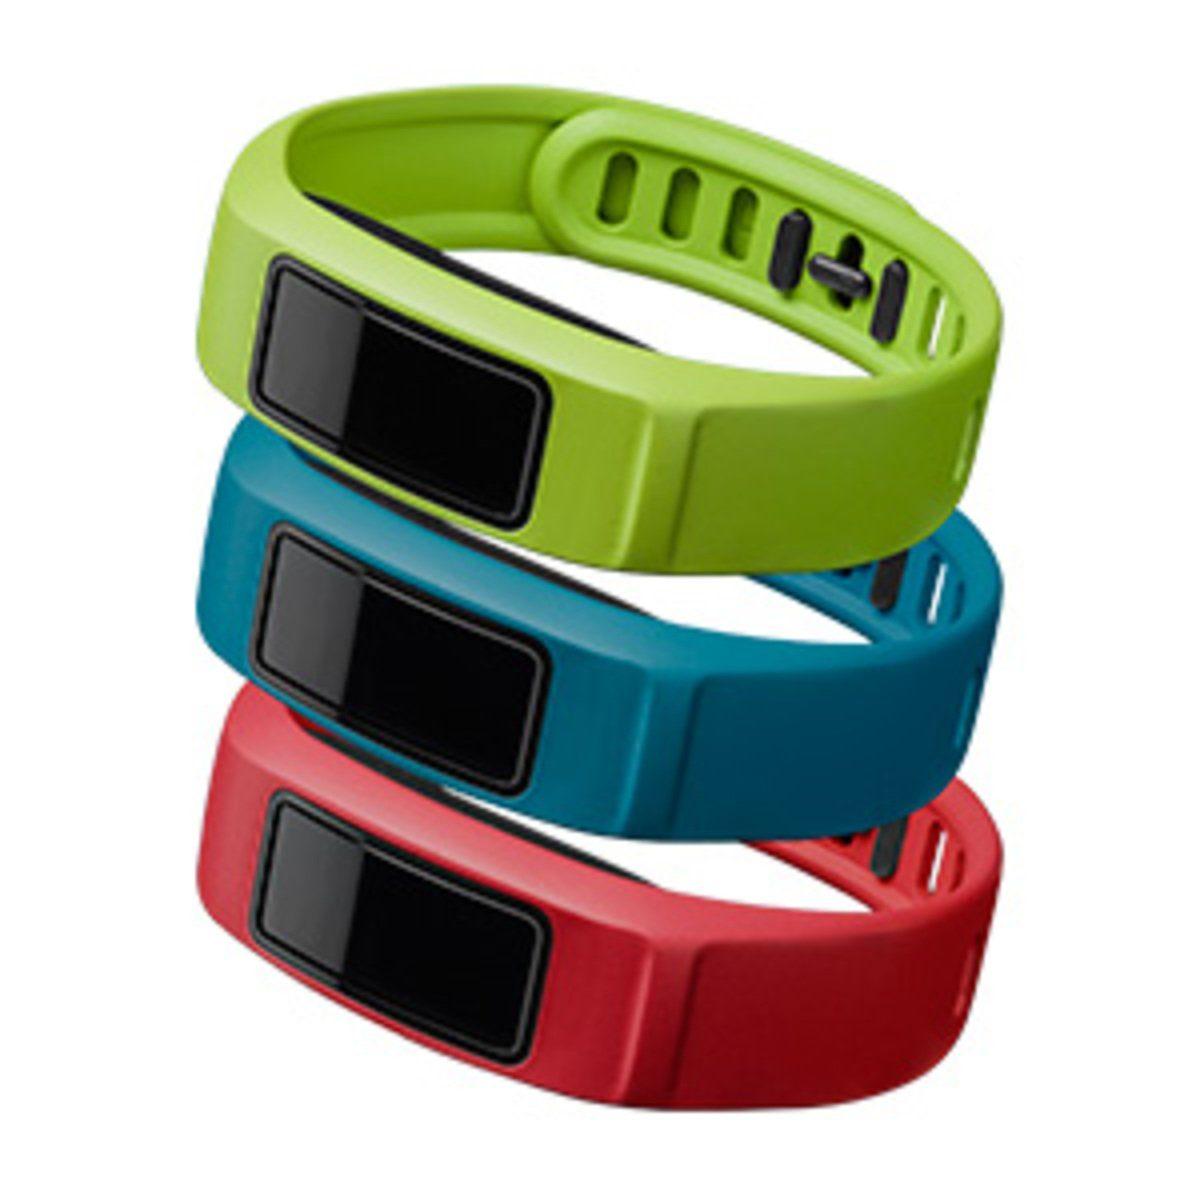 Garmin Ersatzarmbänder »Armbänder vívofit 2 - Grün, Rot, Blau (L)«